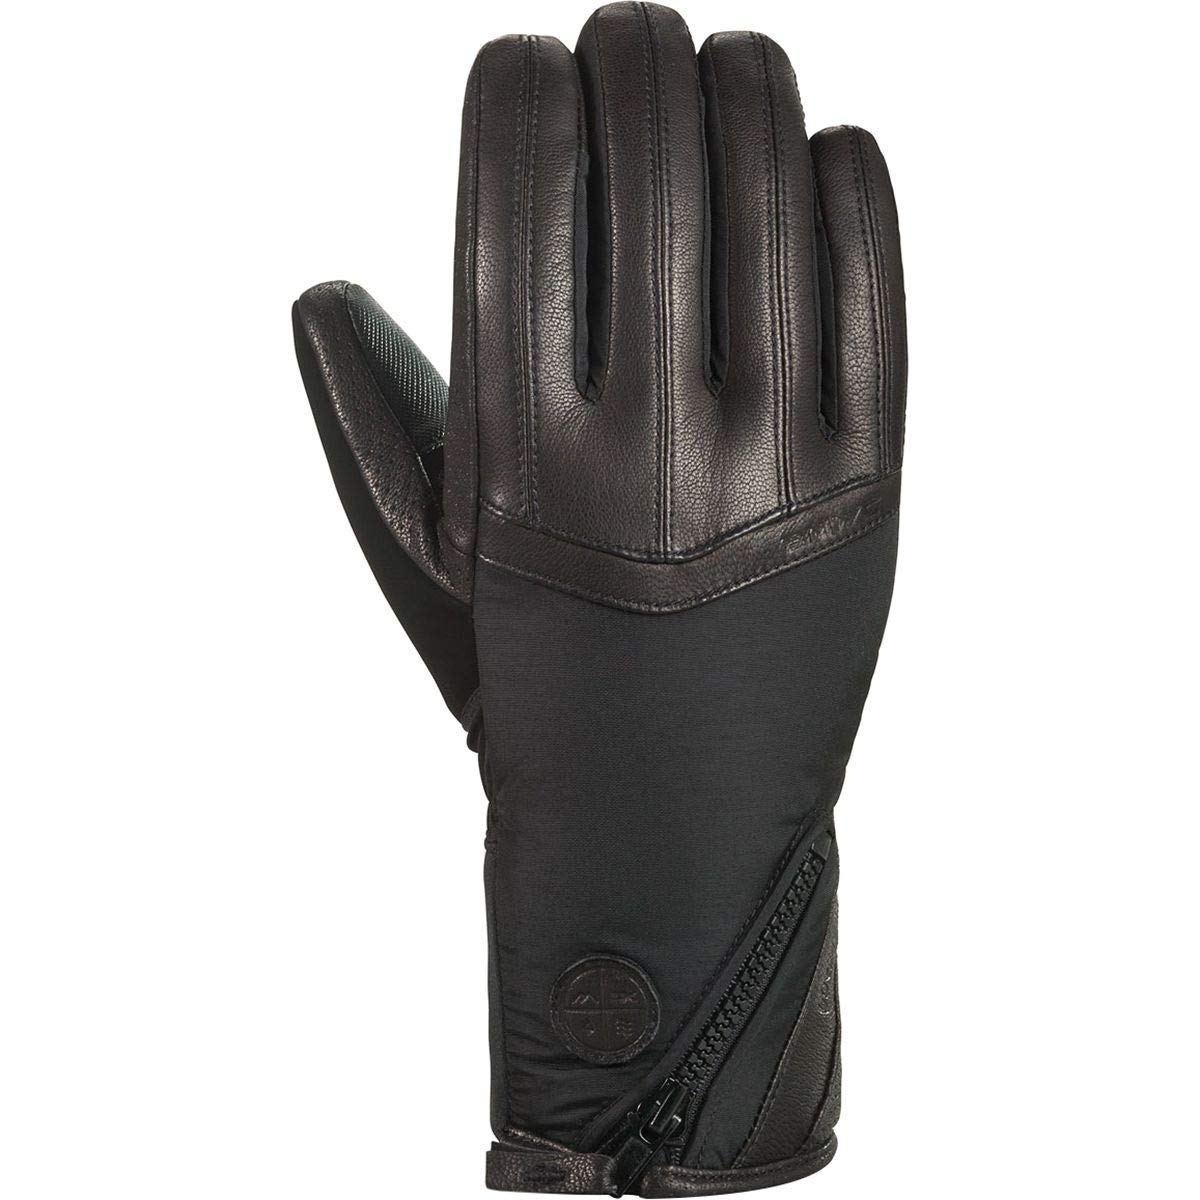 Dakine Women's Targa Gore-Tex Gloves, Black, L